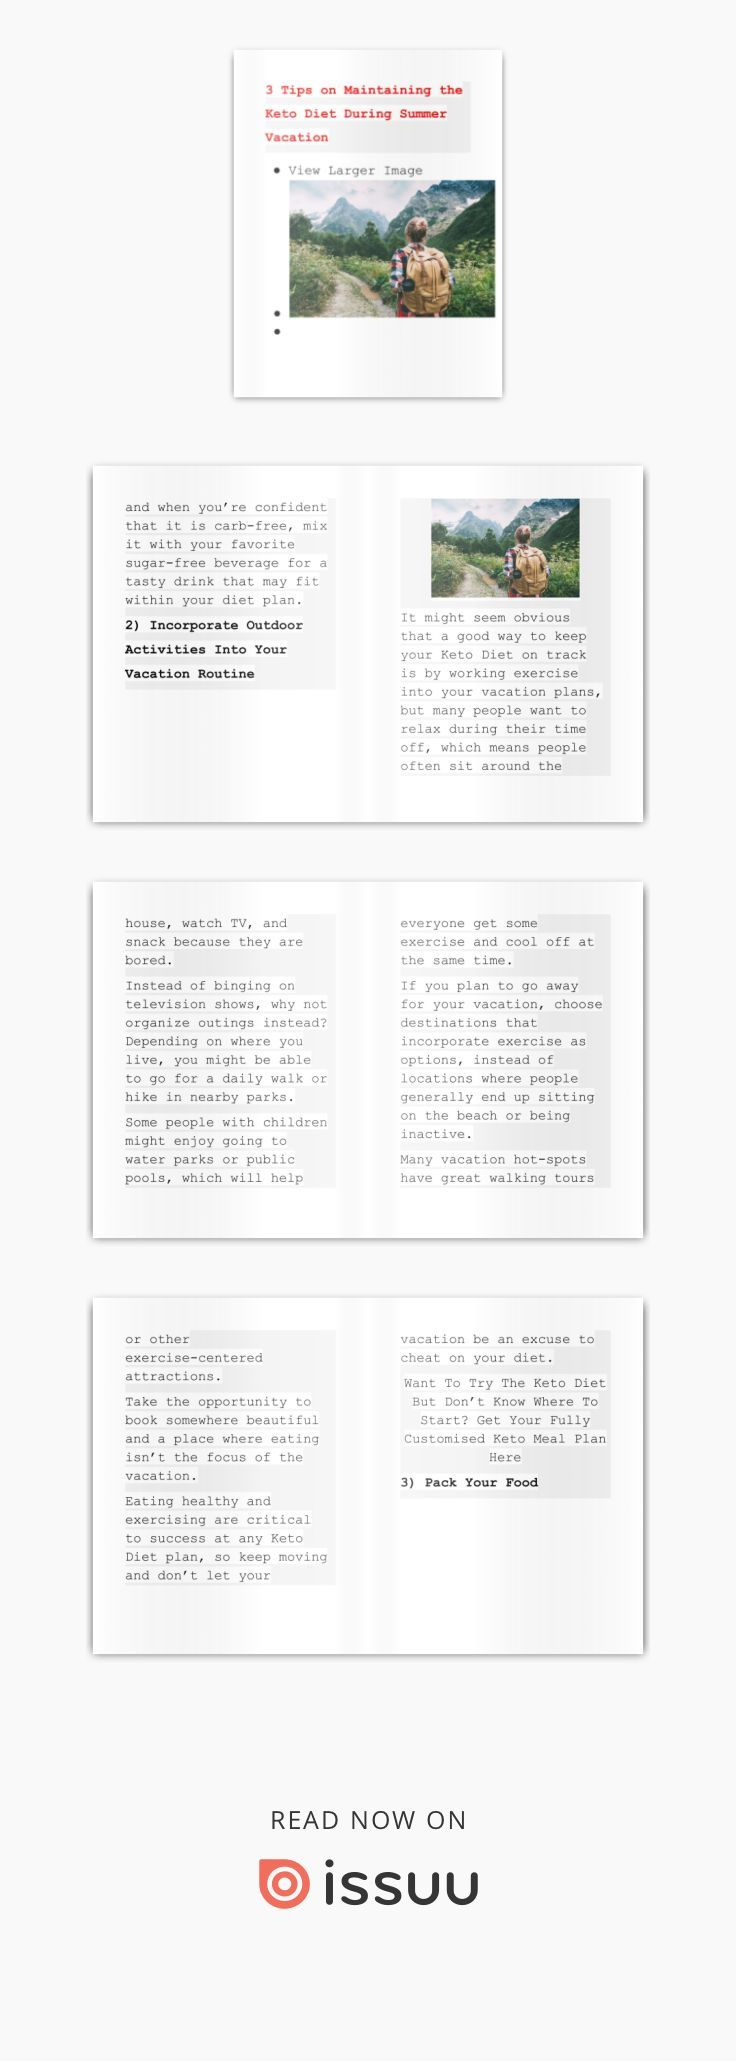 The Custom Keto Diet PDF Book Free Download